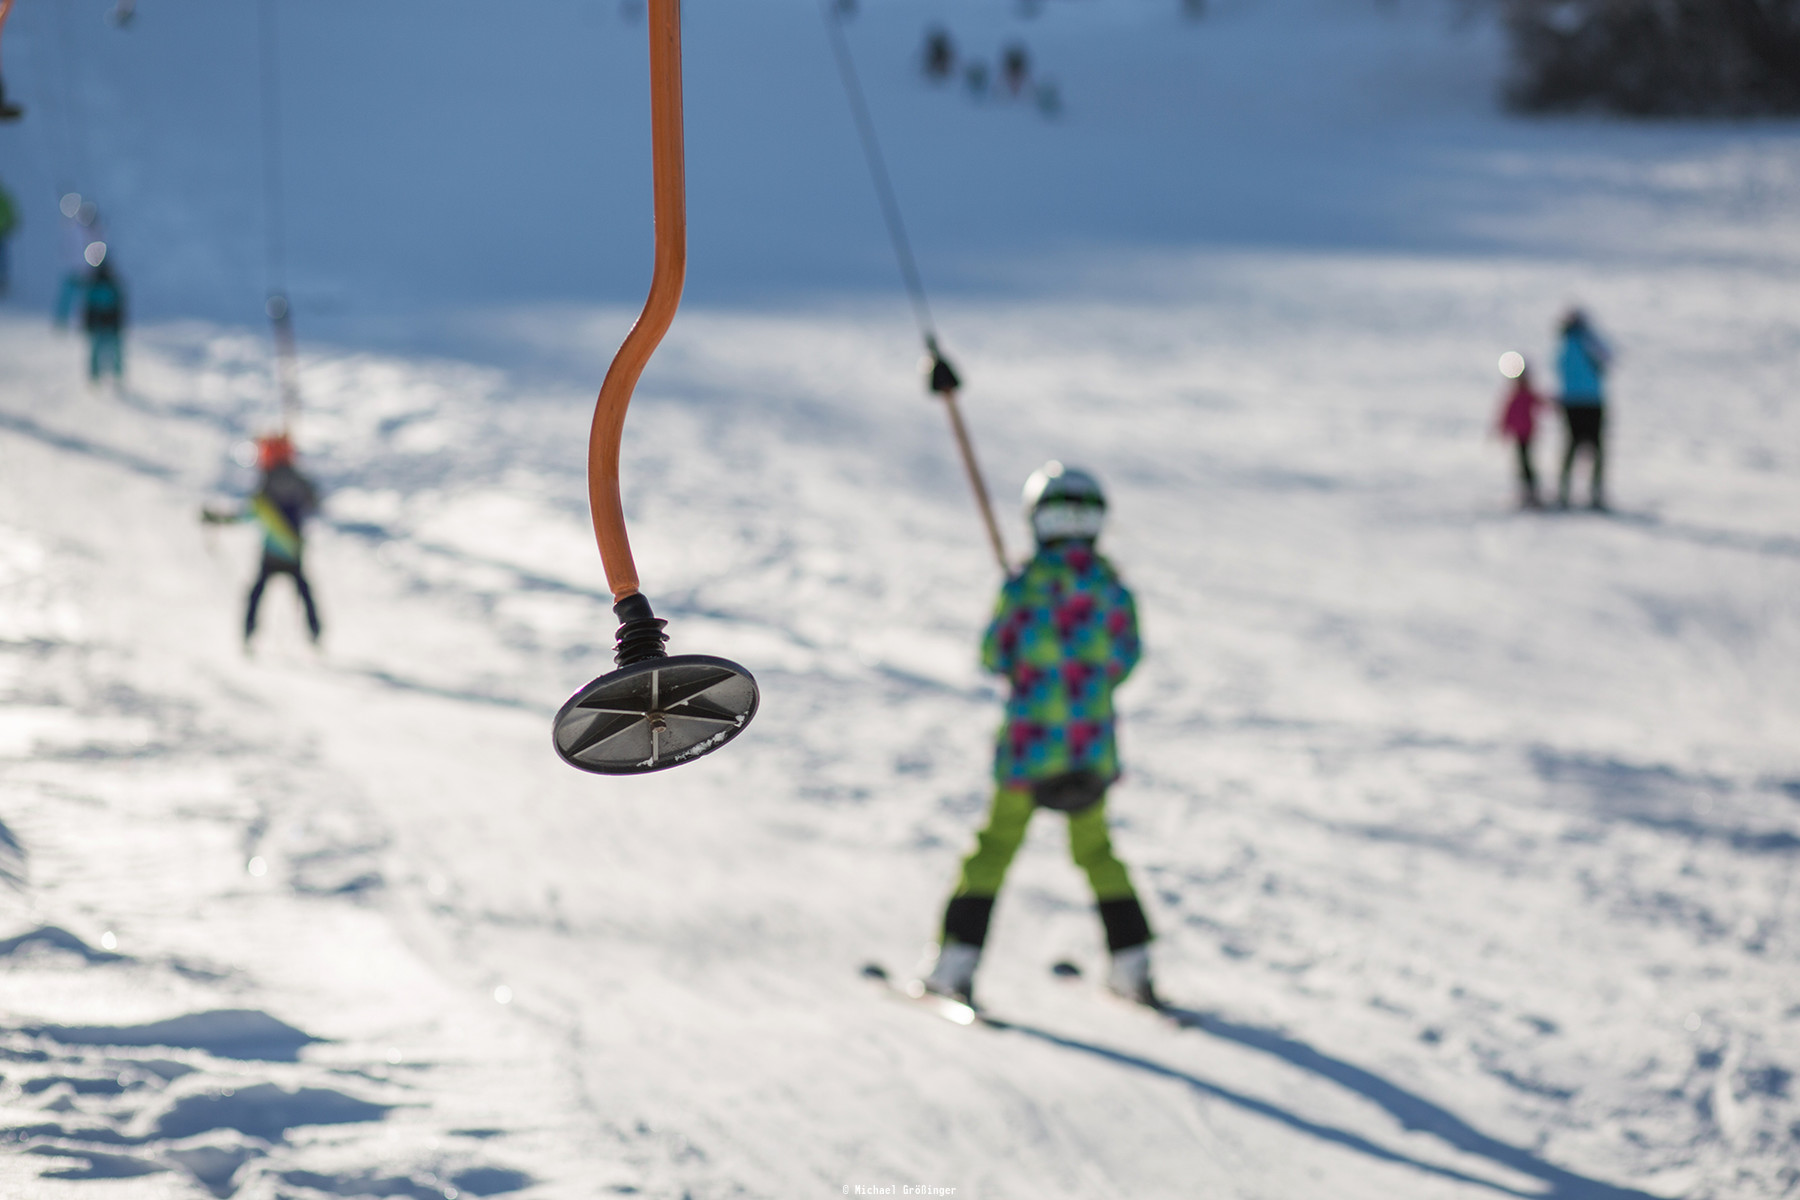 ski lift skiing snowboarding - photo #31